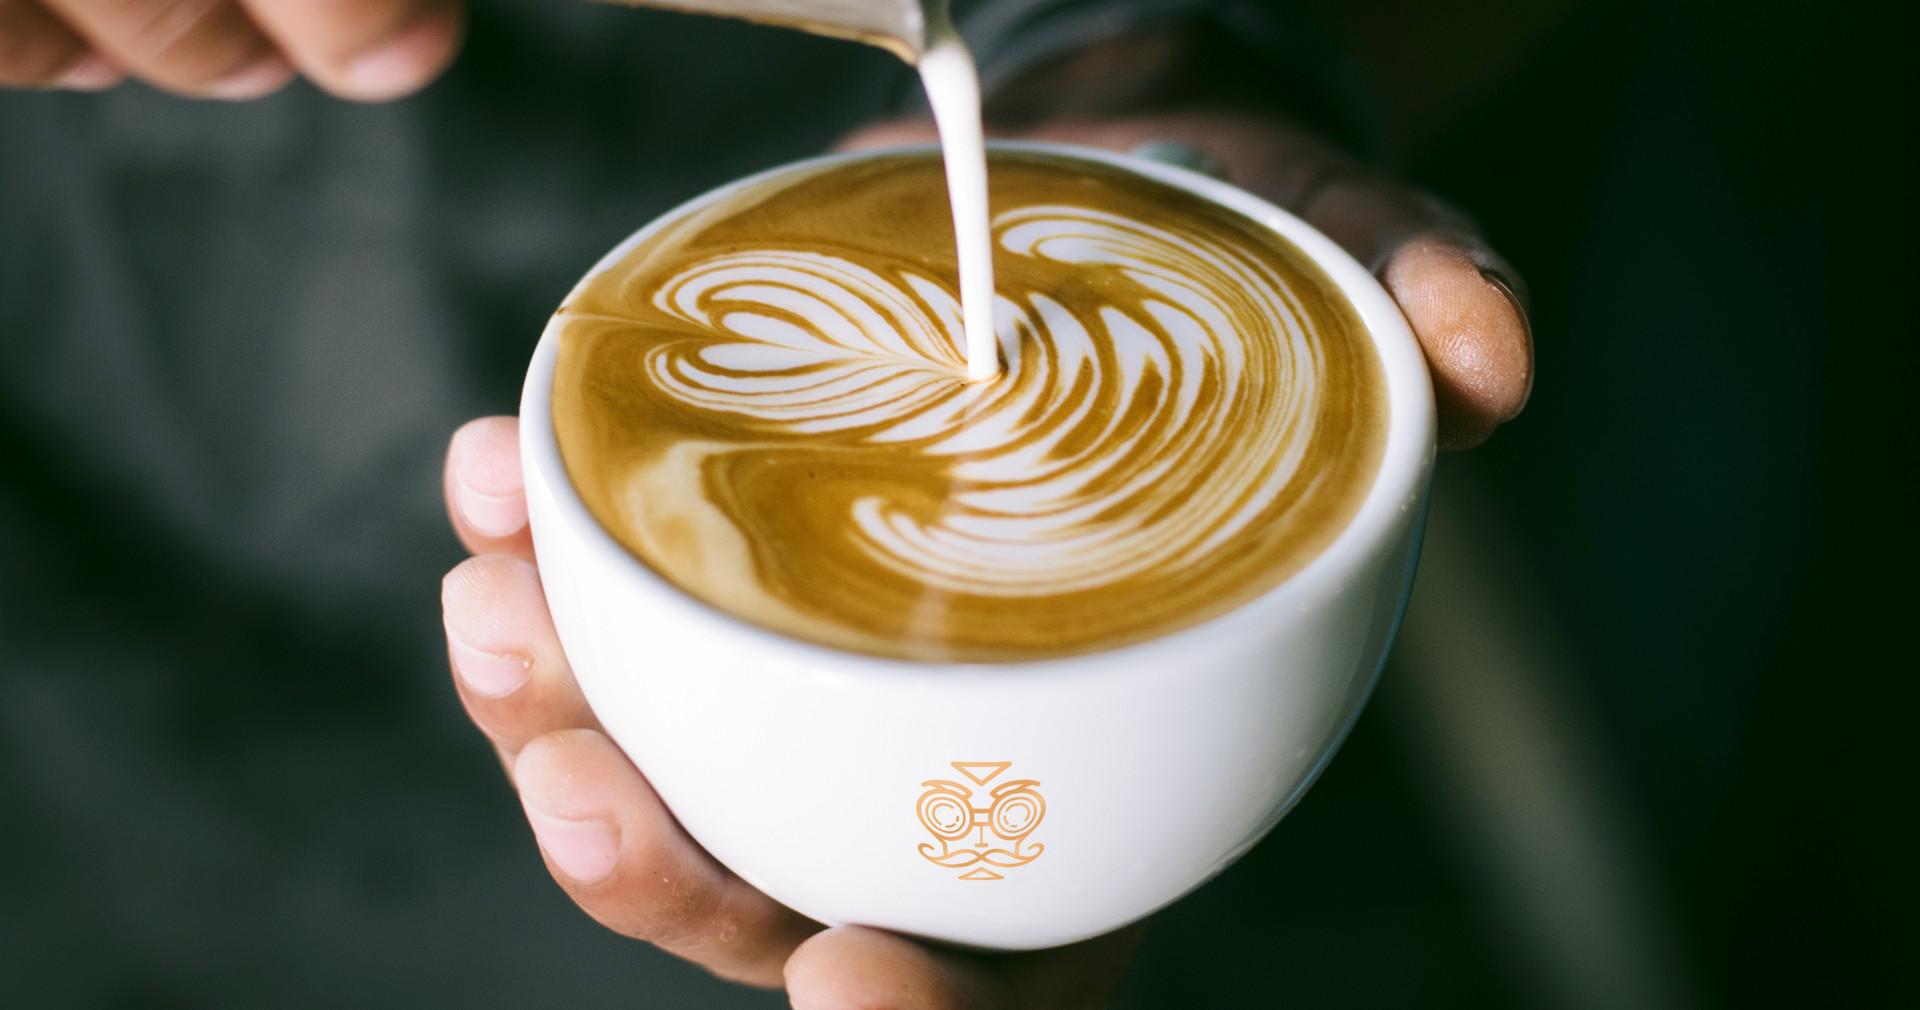 Blacksmith-coffee-pouring-milk.jpg